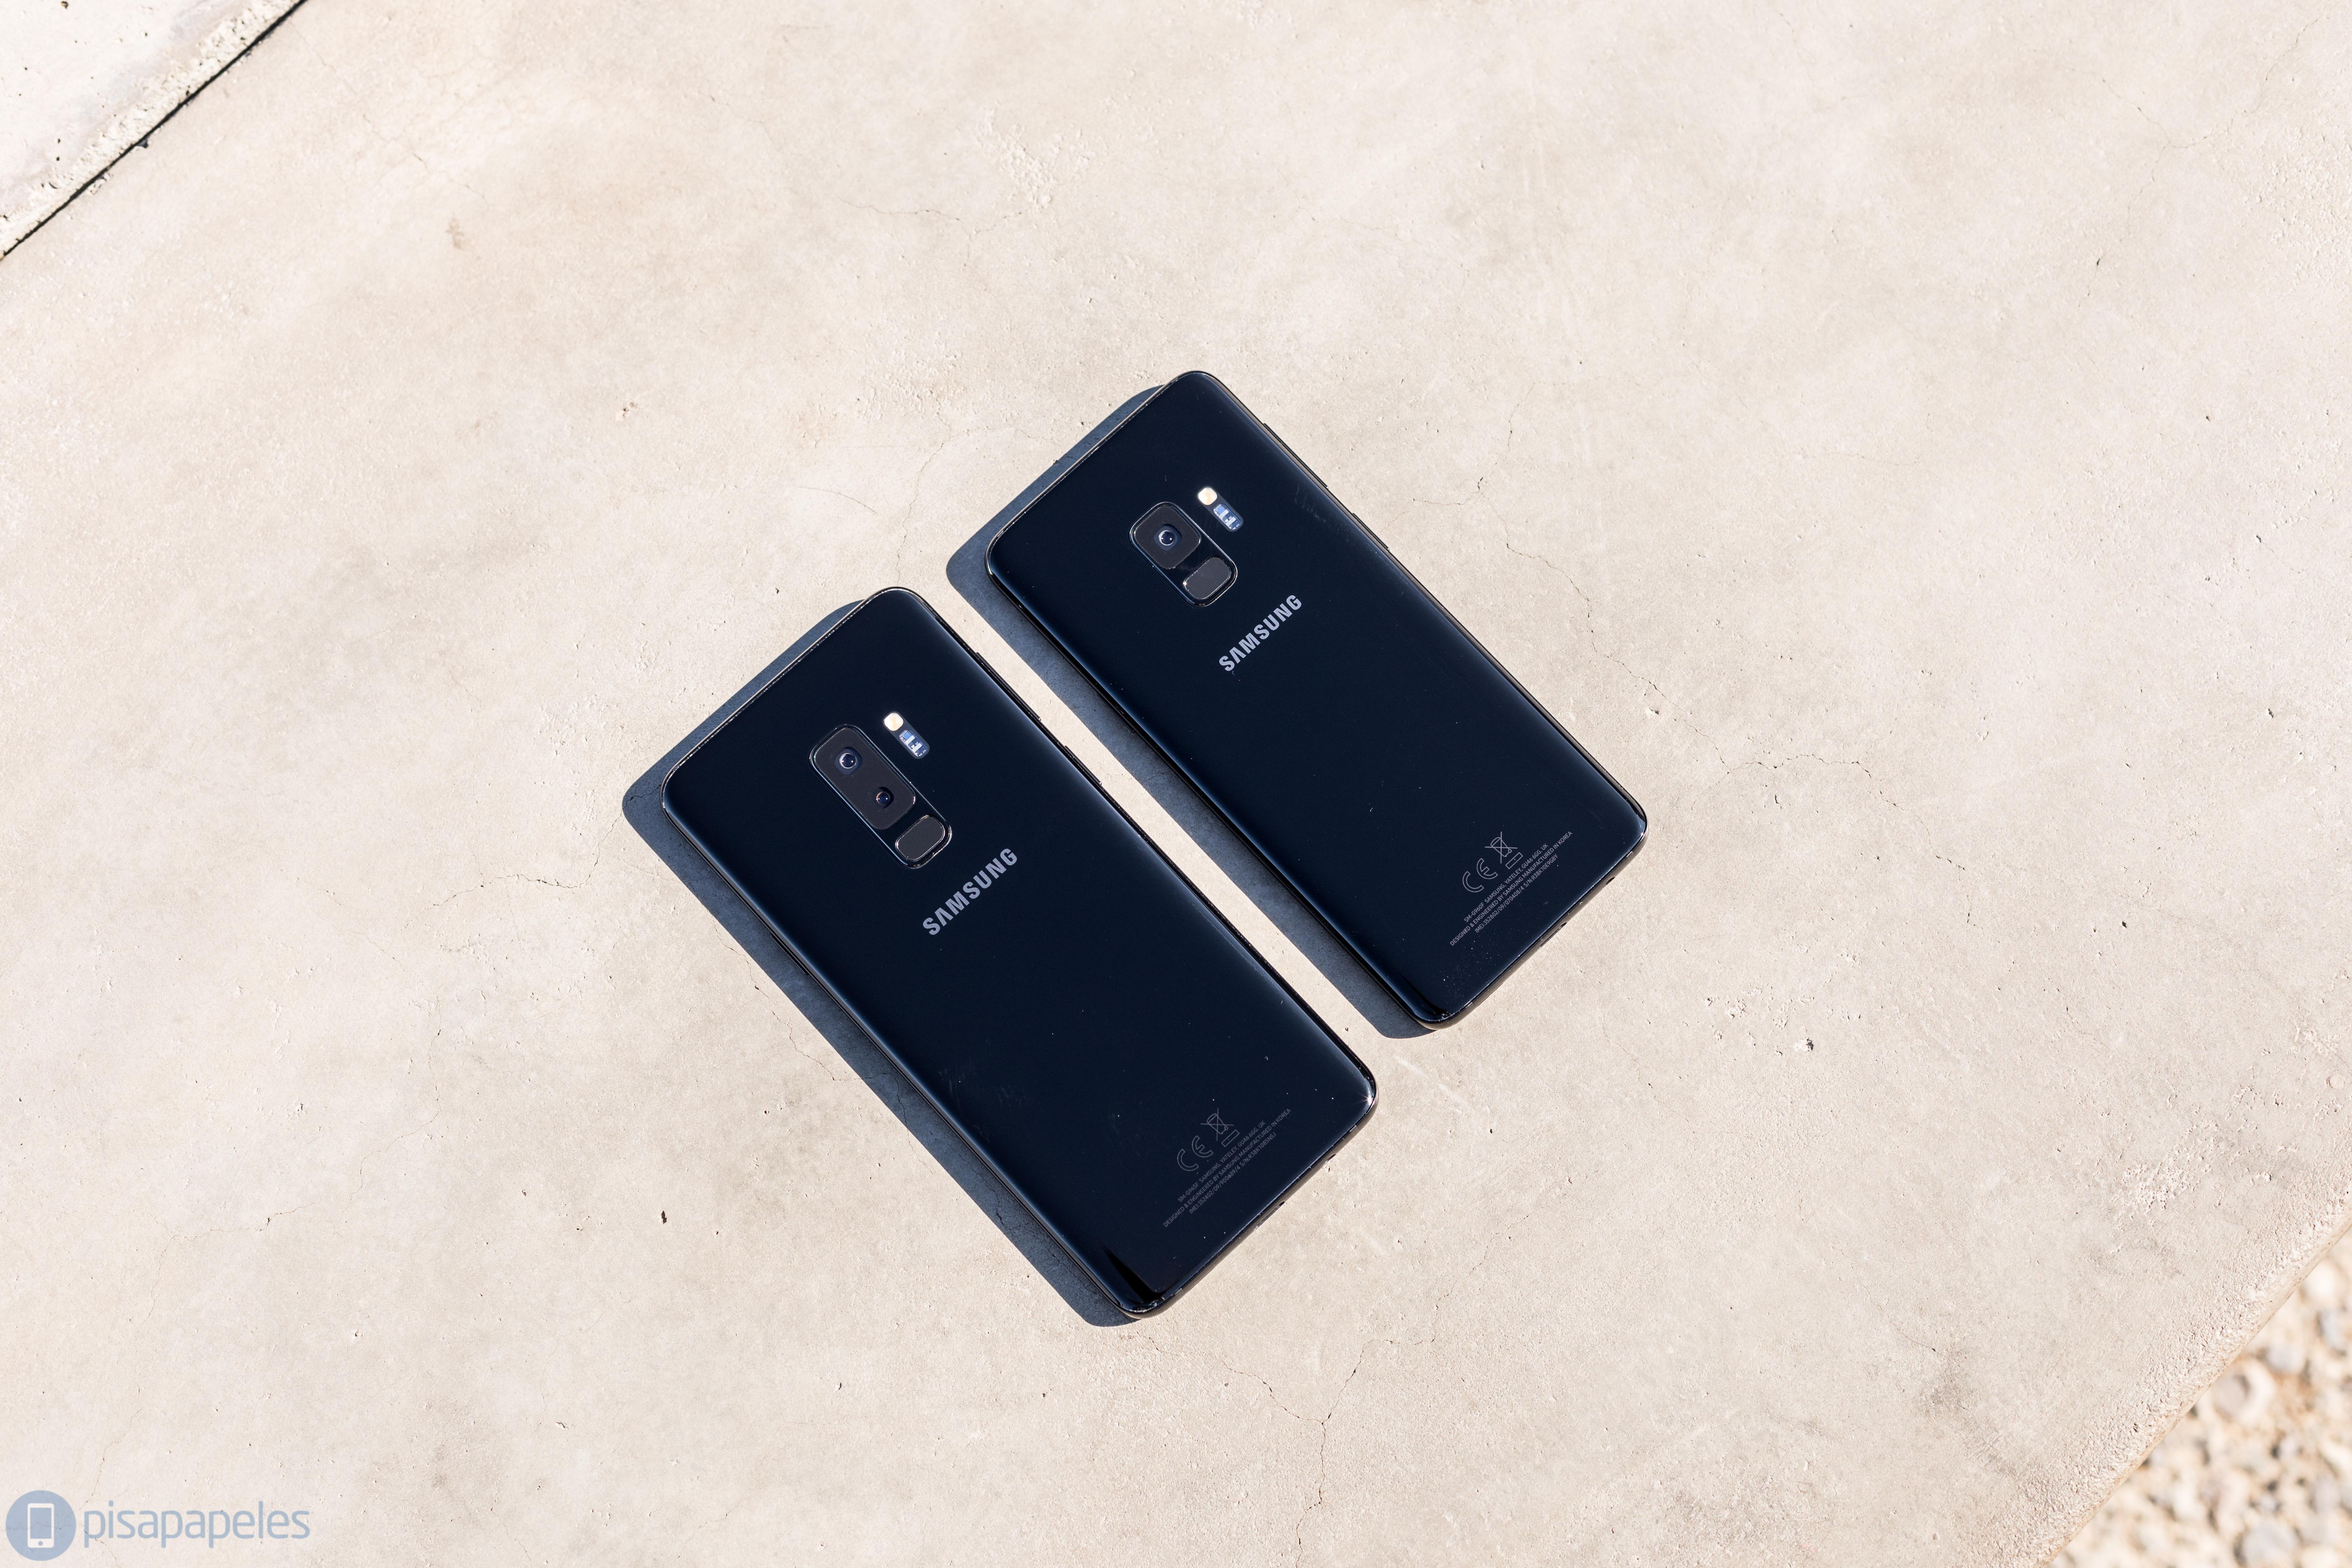 Samsung İnceleme Galaxy S9 ve Galaxy S9 + 3